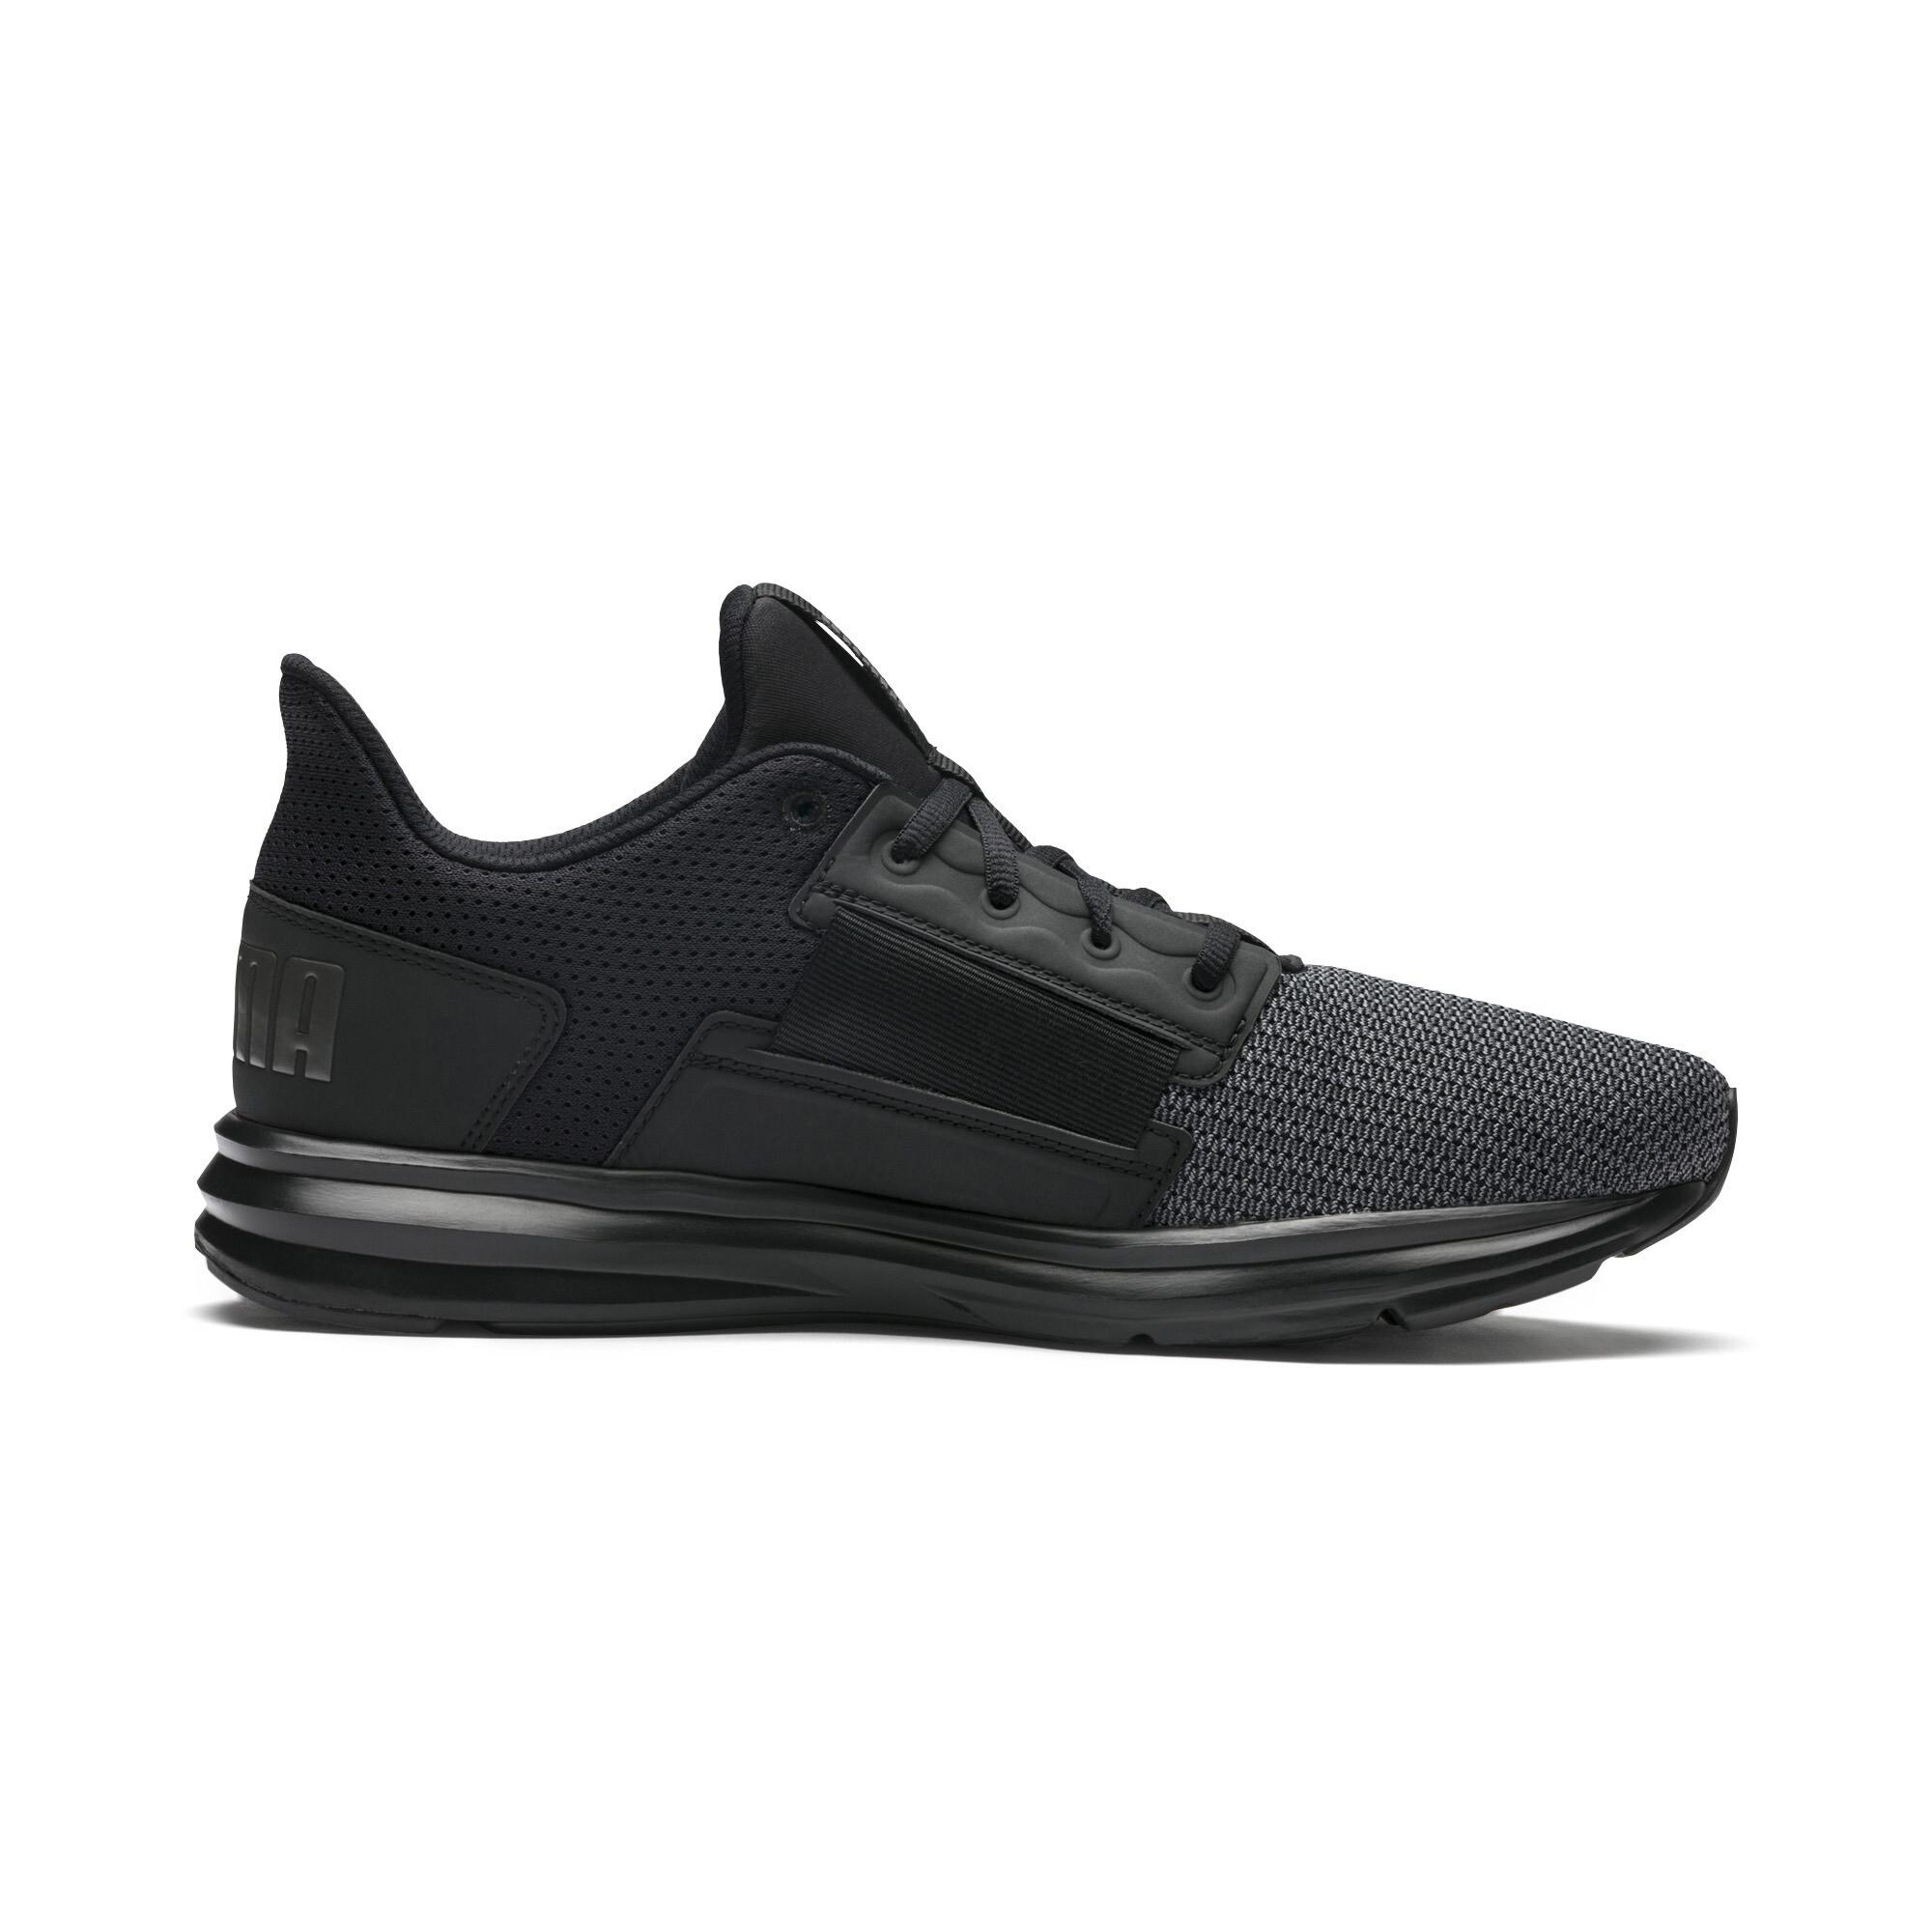 Zapatillas de running Enzo Street para hombre